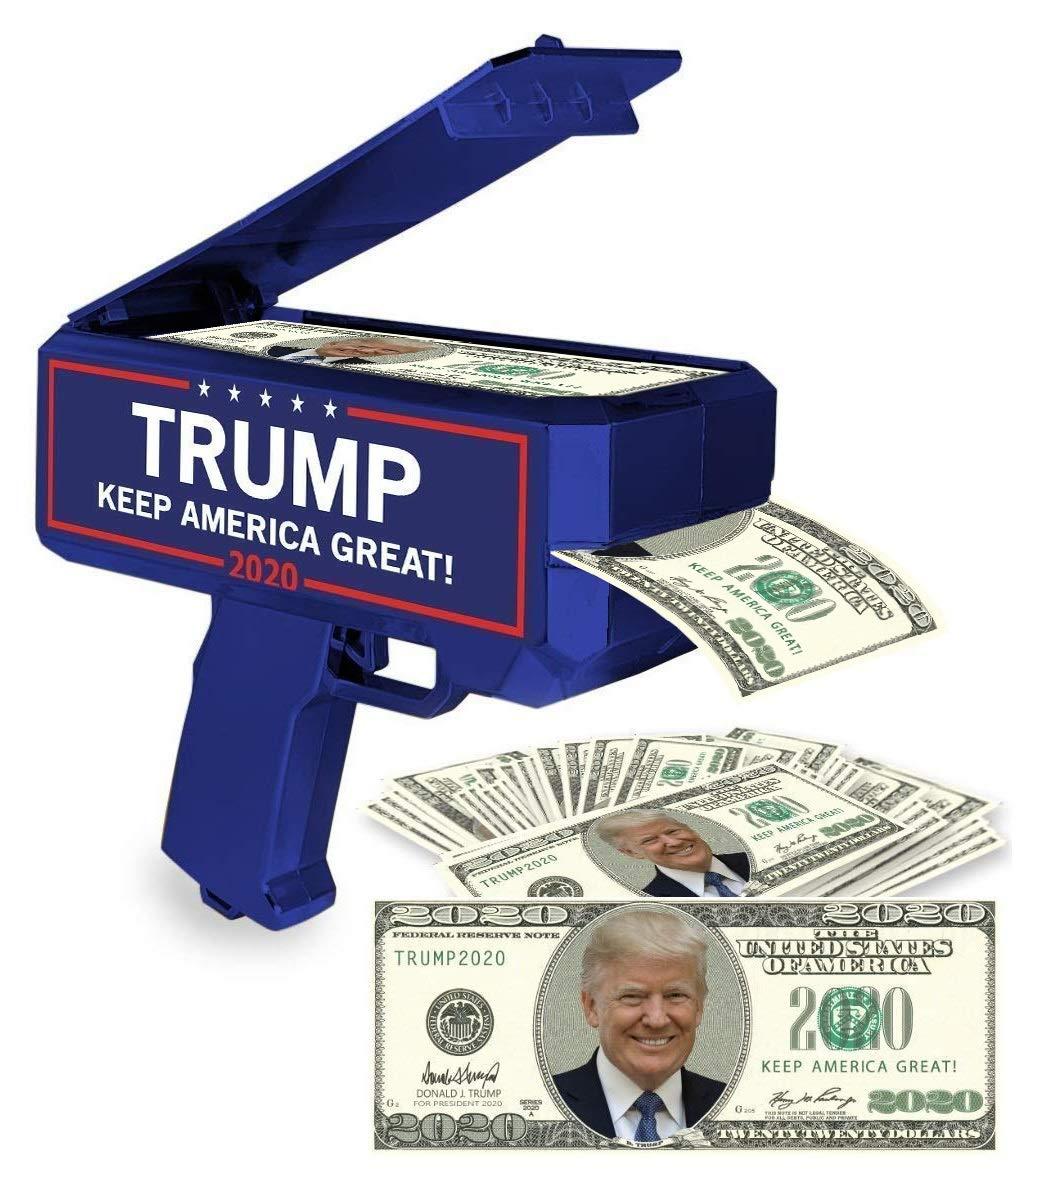 NinoStar Donald Trump Money Gun | Keep America Great 2020 Re-Election Cash Spray| Rain Money Shotter | Pack of 100 Presidential Dollar Bill + Free Bonus 2020 Car Air Fresh 71ywXeXyeuL